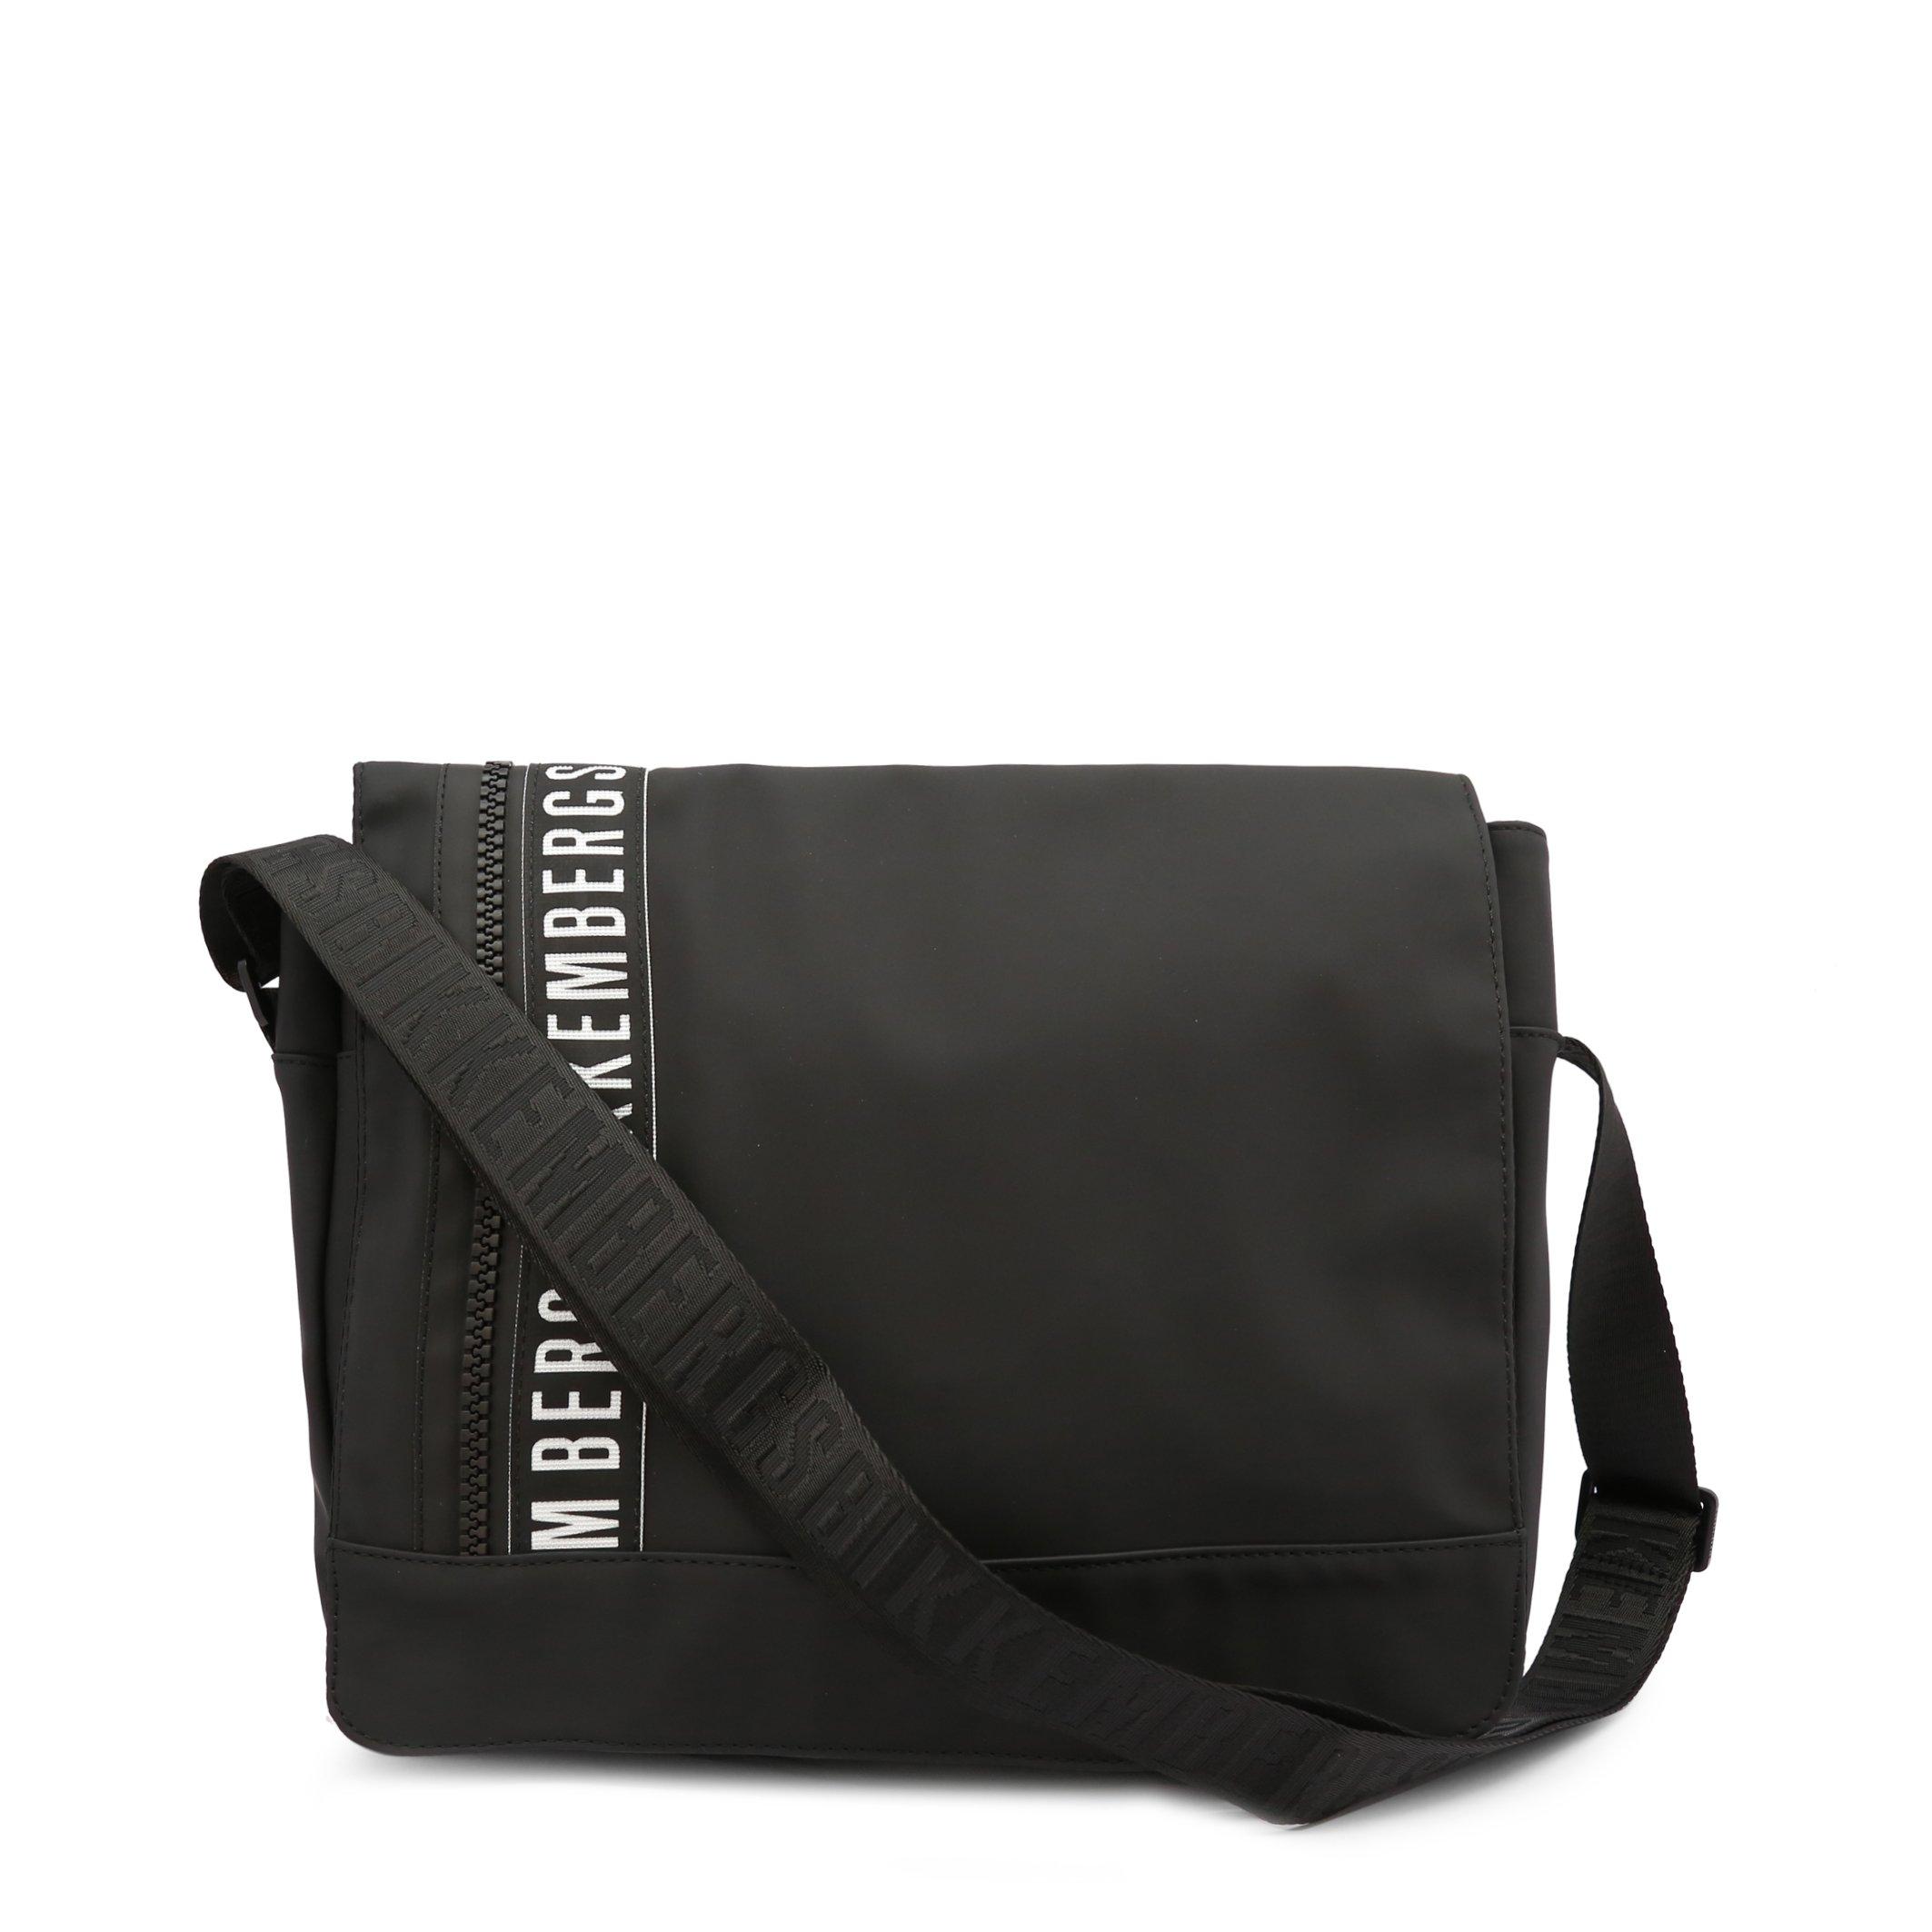 Bikkembergs Men's Briefcase Black E2BPME170042 - black-1 NOSIZE